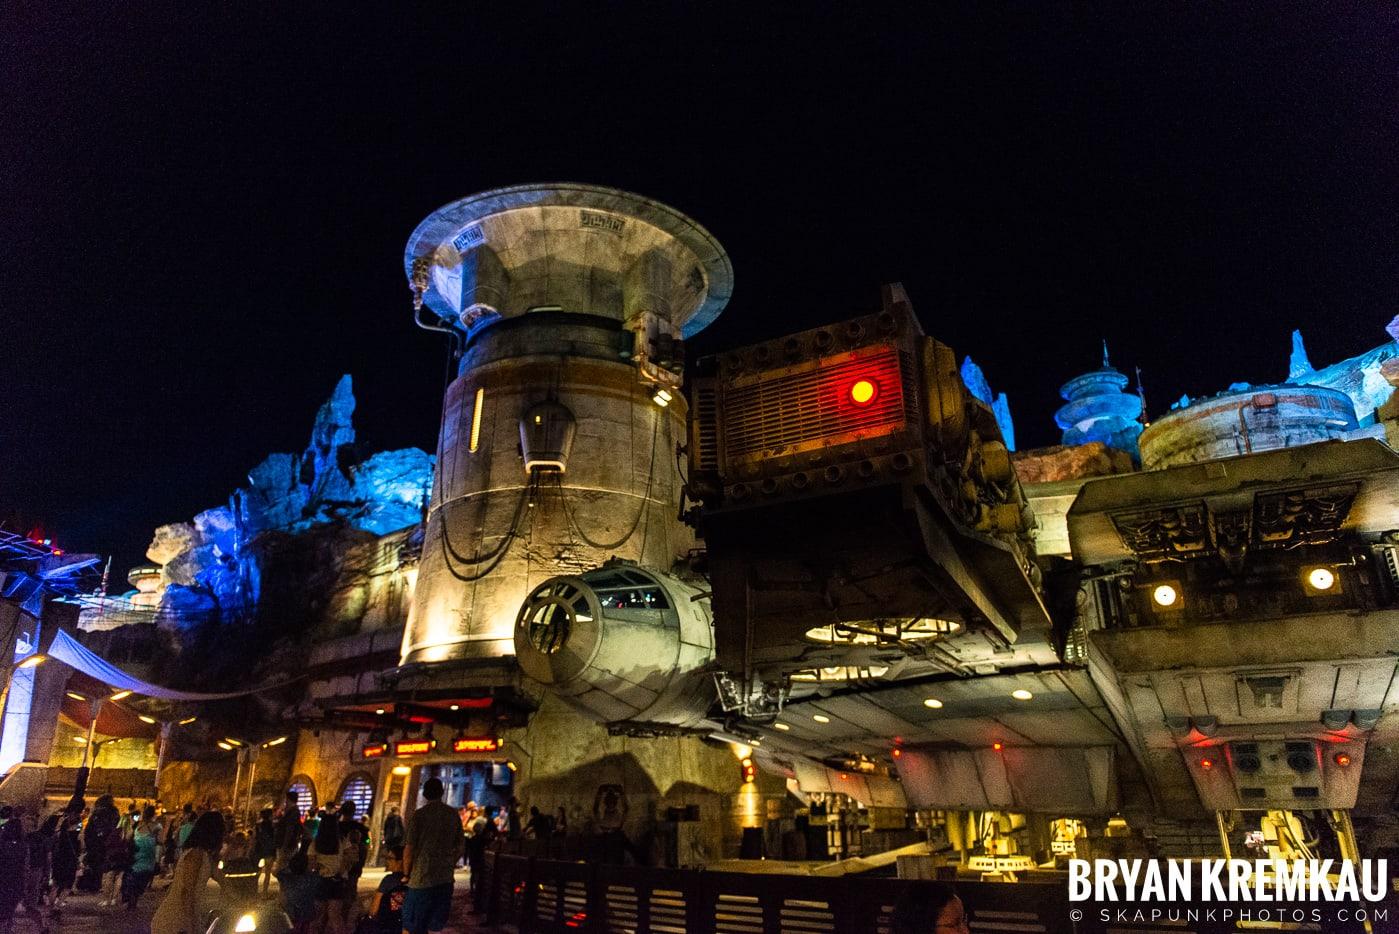 Walt Disney World Vacation: Day 5 (Animal Kingdom / Disney's Hollywood Studios) - 10.3.19 (15)